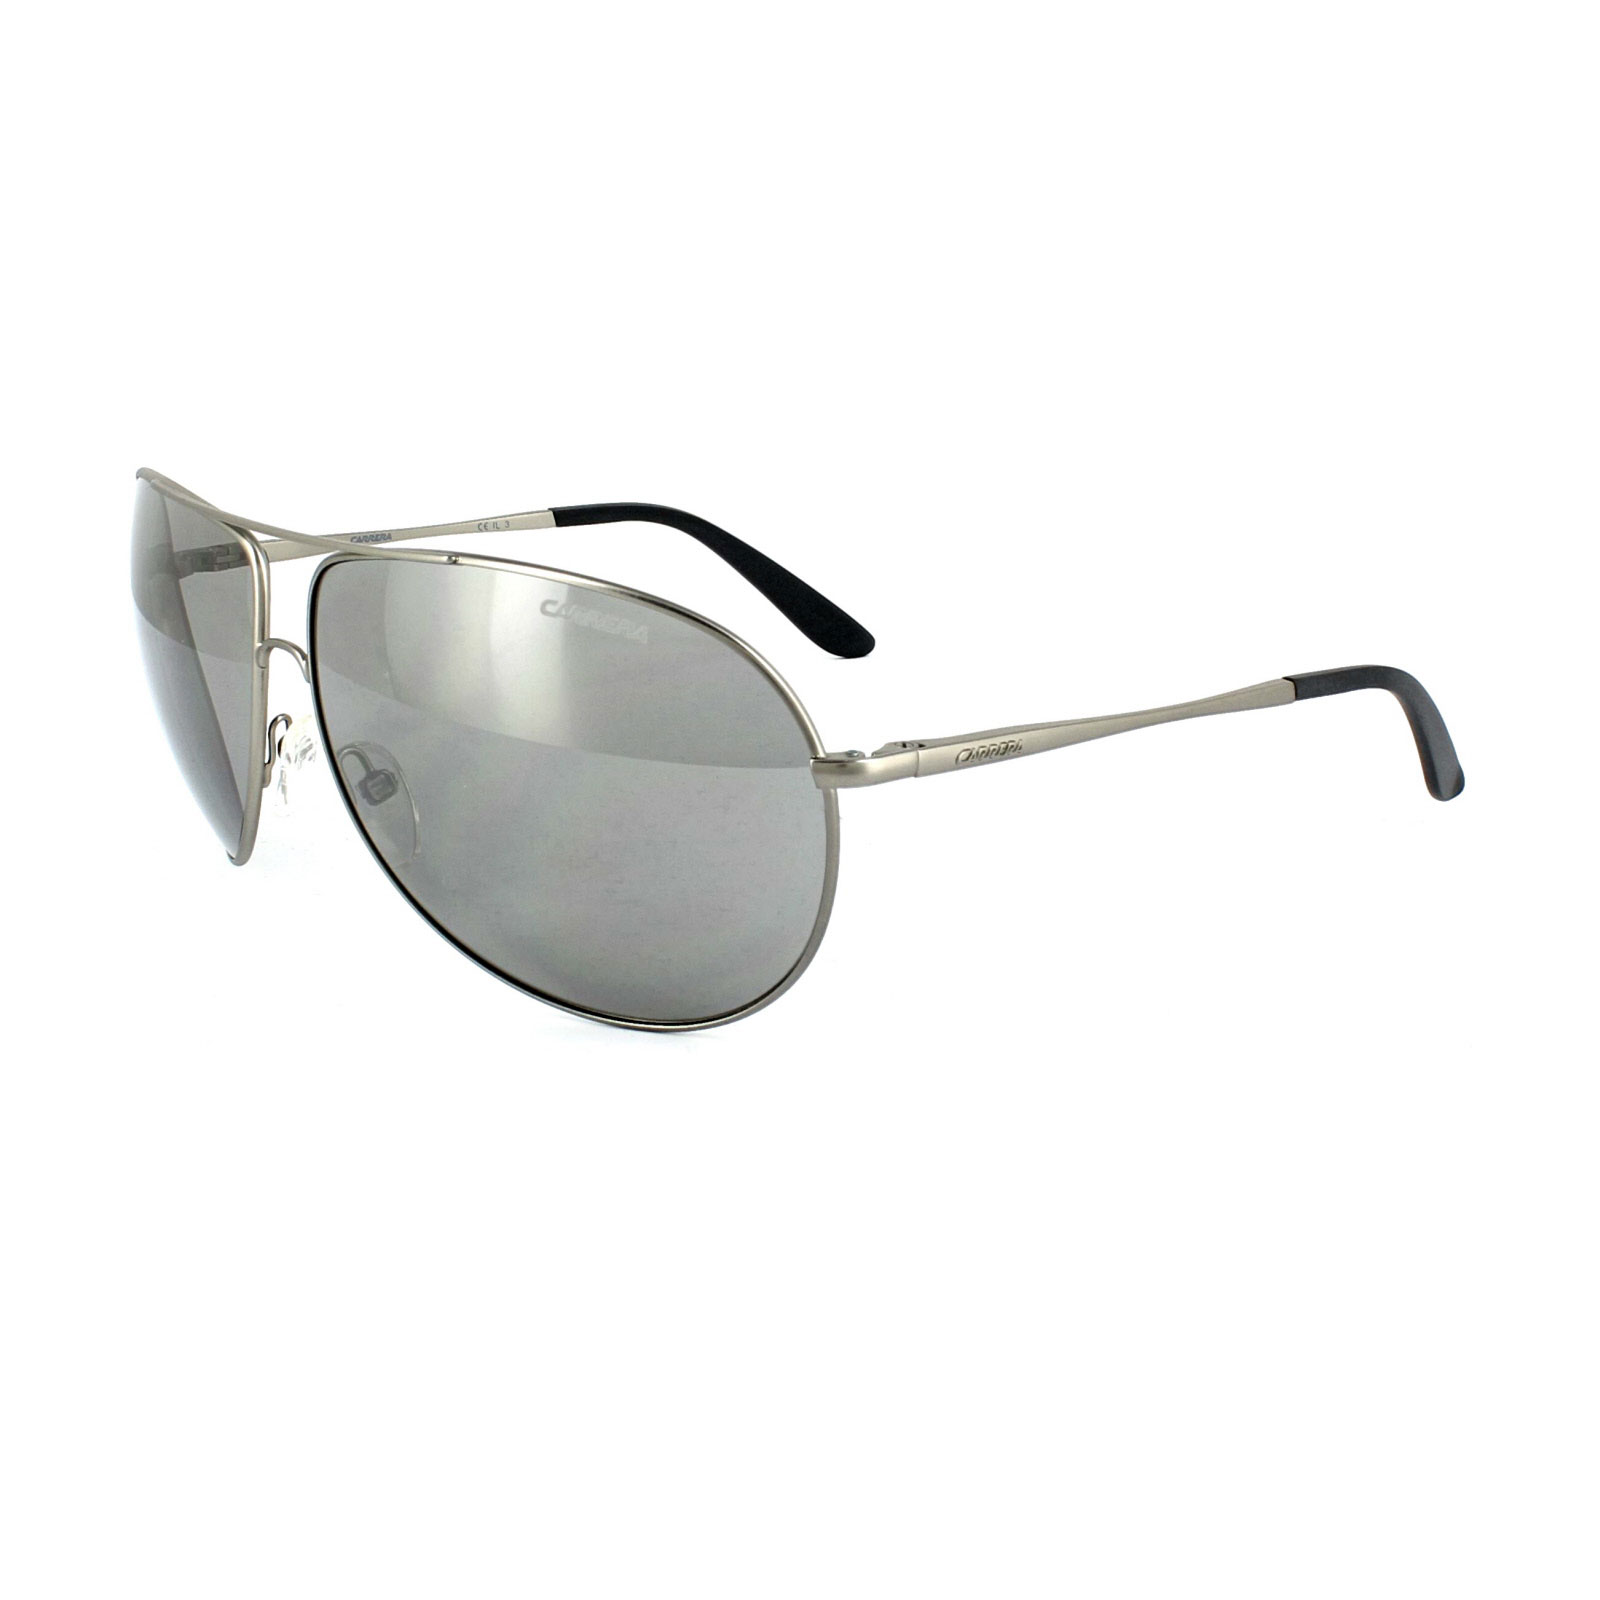 Carrera Sunglasses Gipsy  carrera sunglasses new gipsy r80 t4 matt dark ruthenium smoke grey